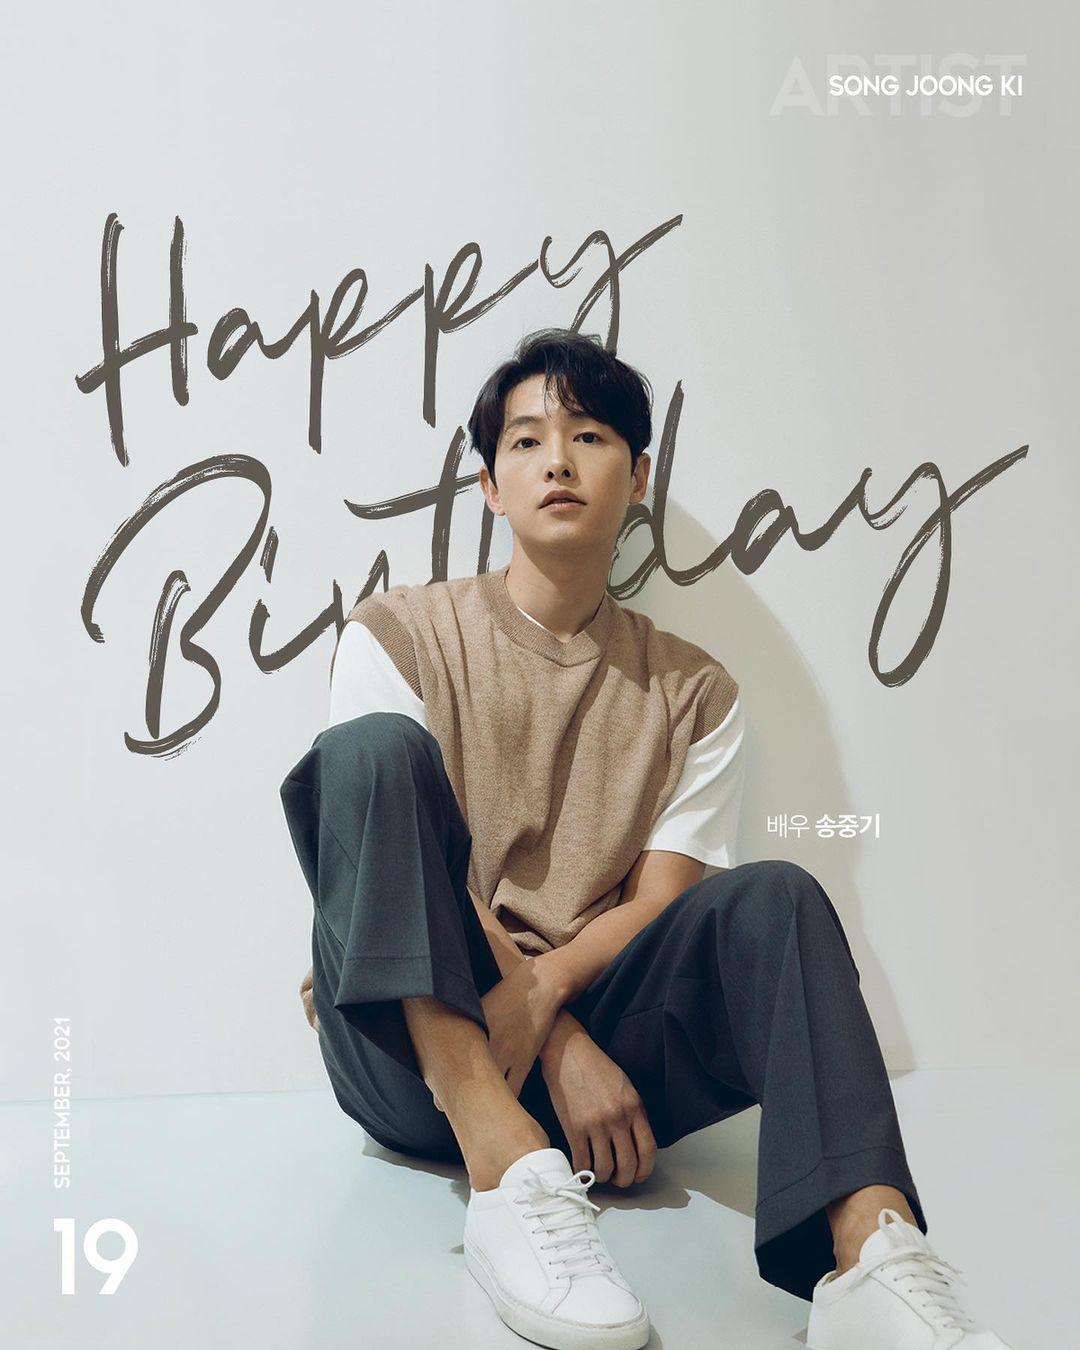 Song Joong Ki's birthday